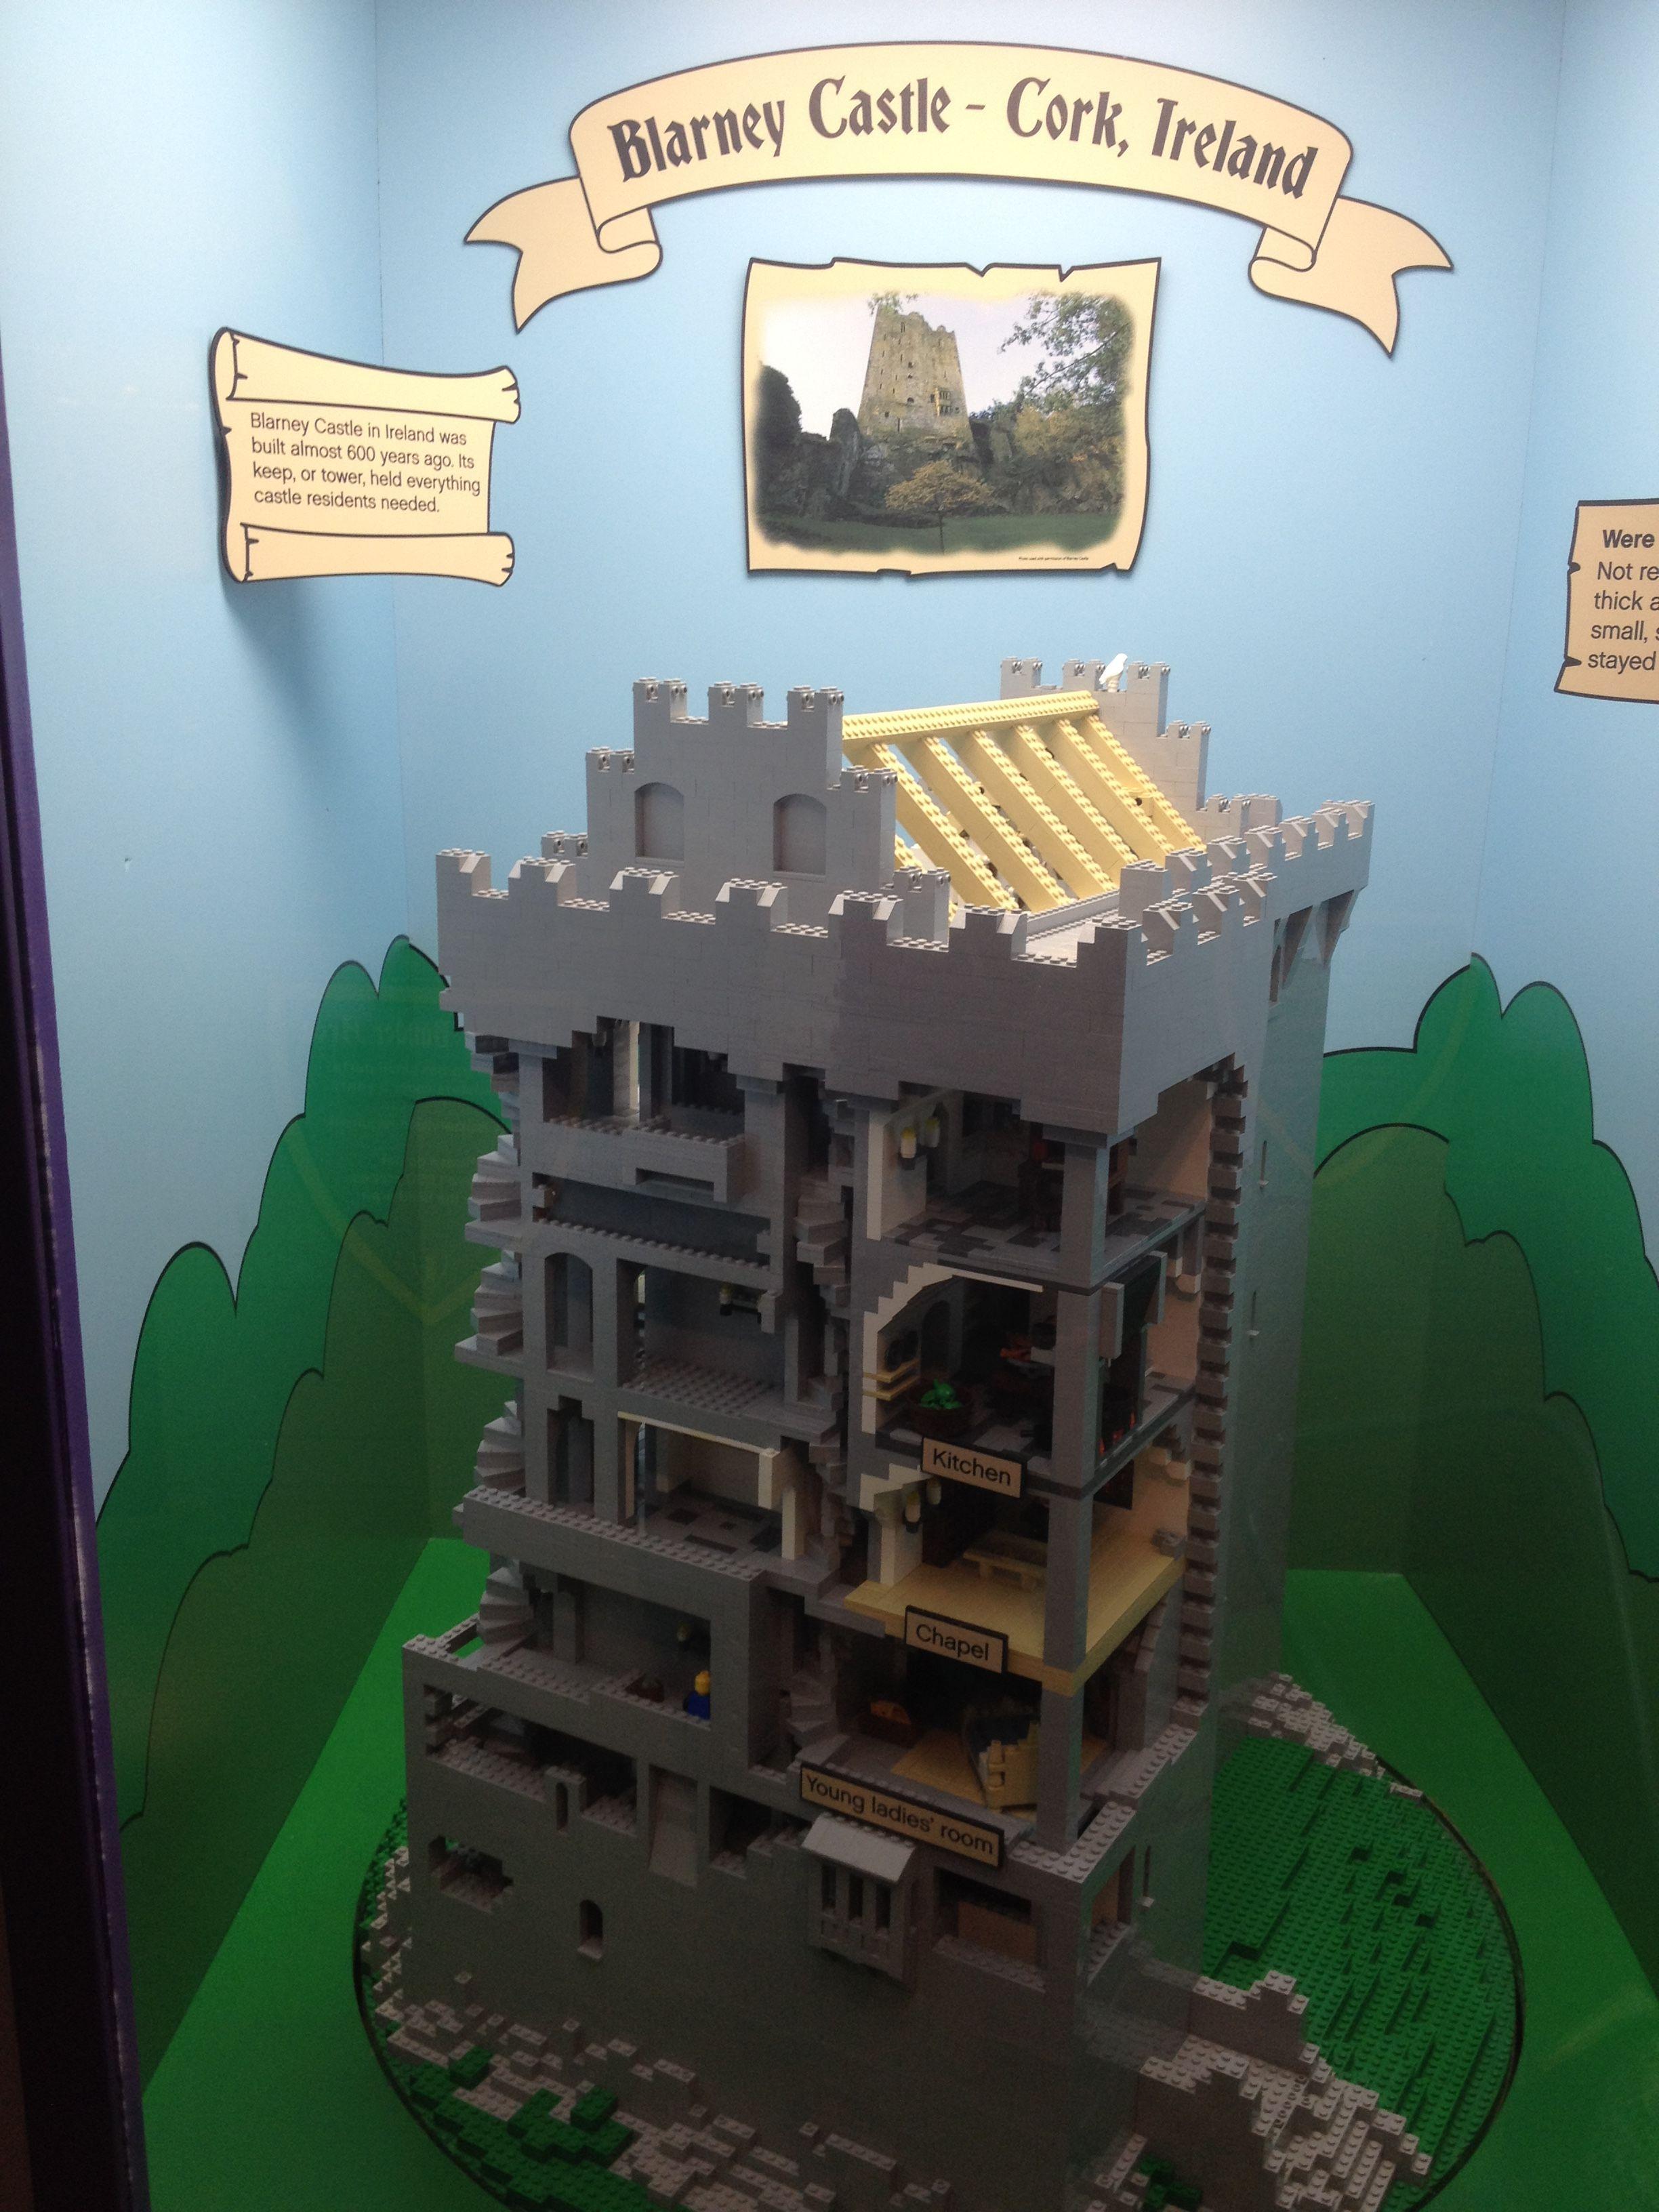 lego set of blarney castle cork ireland lego